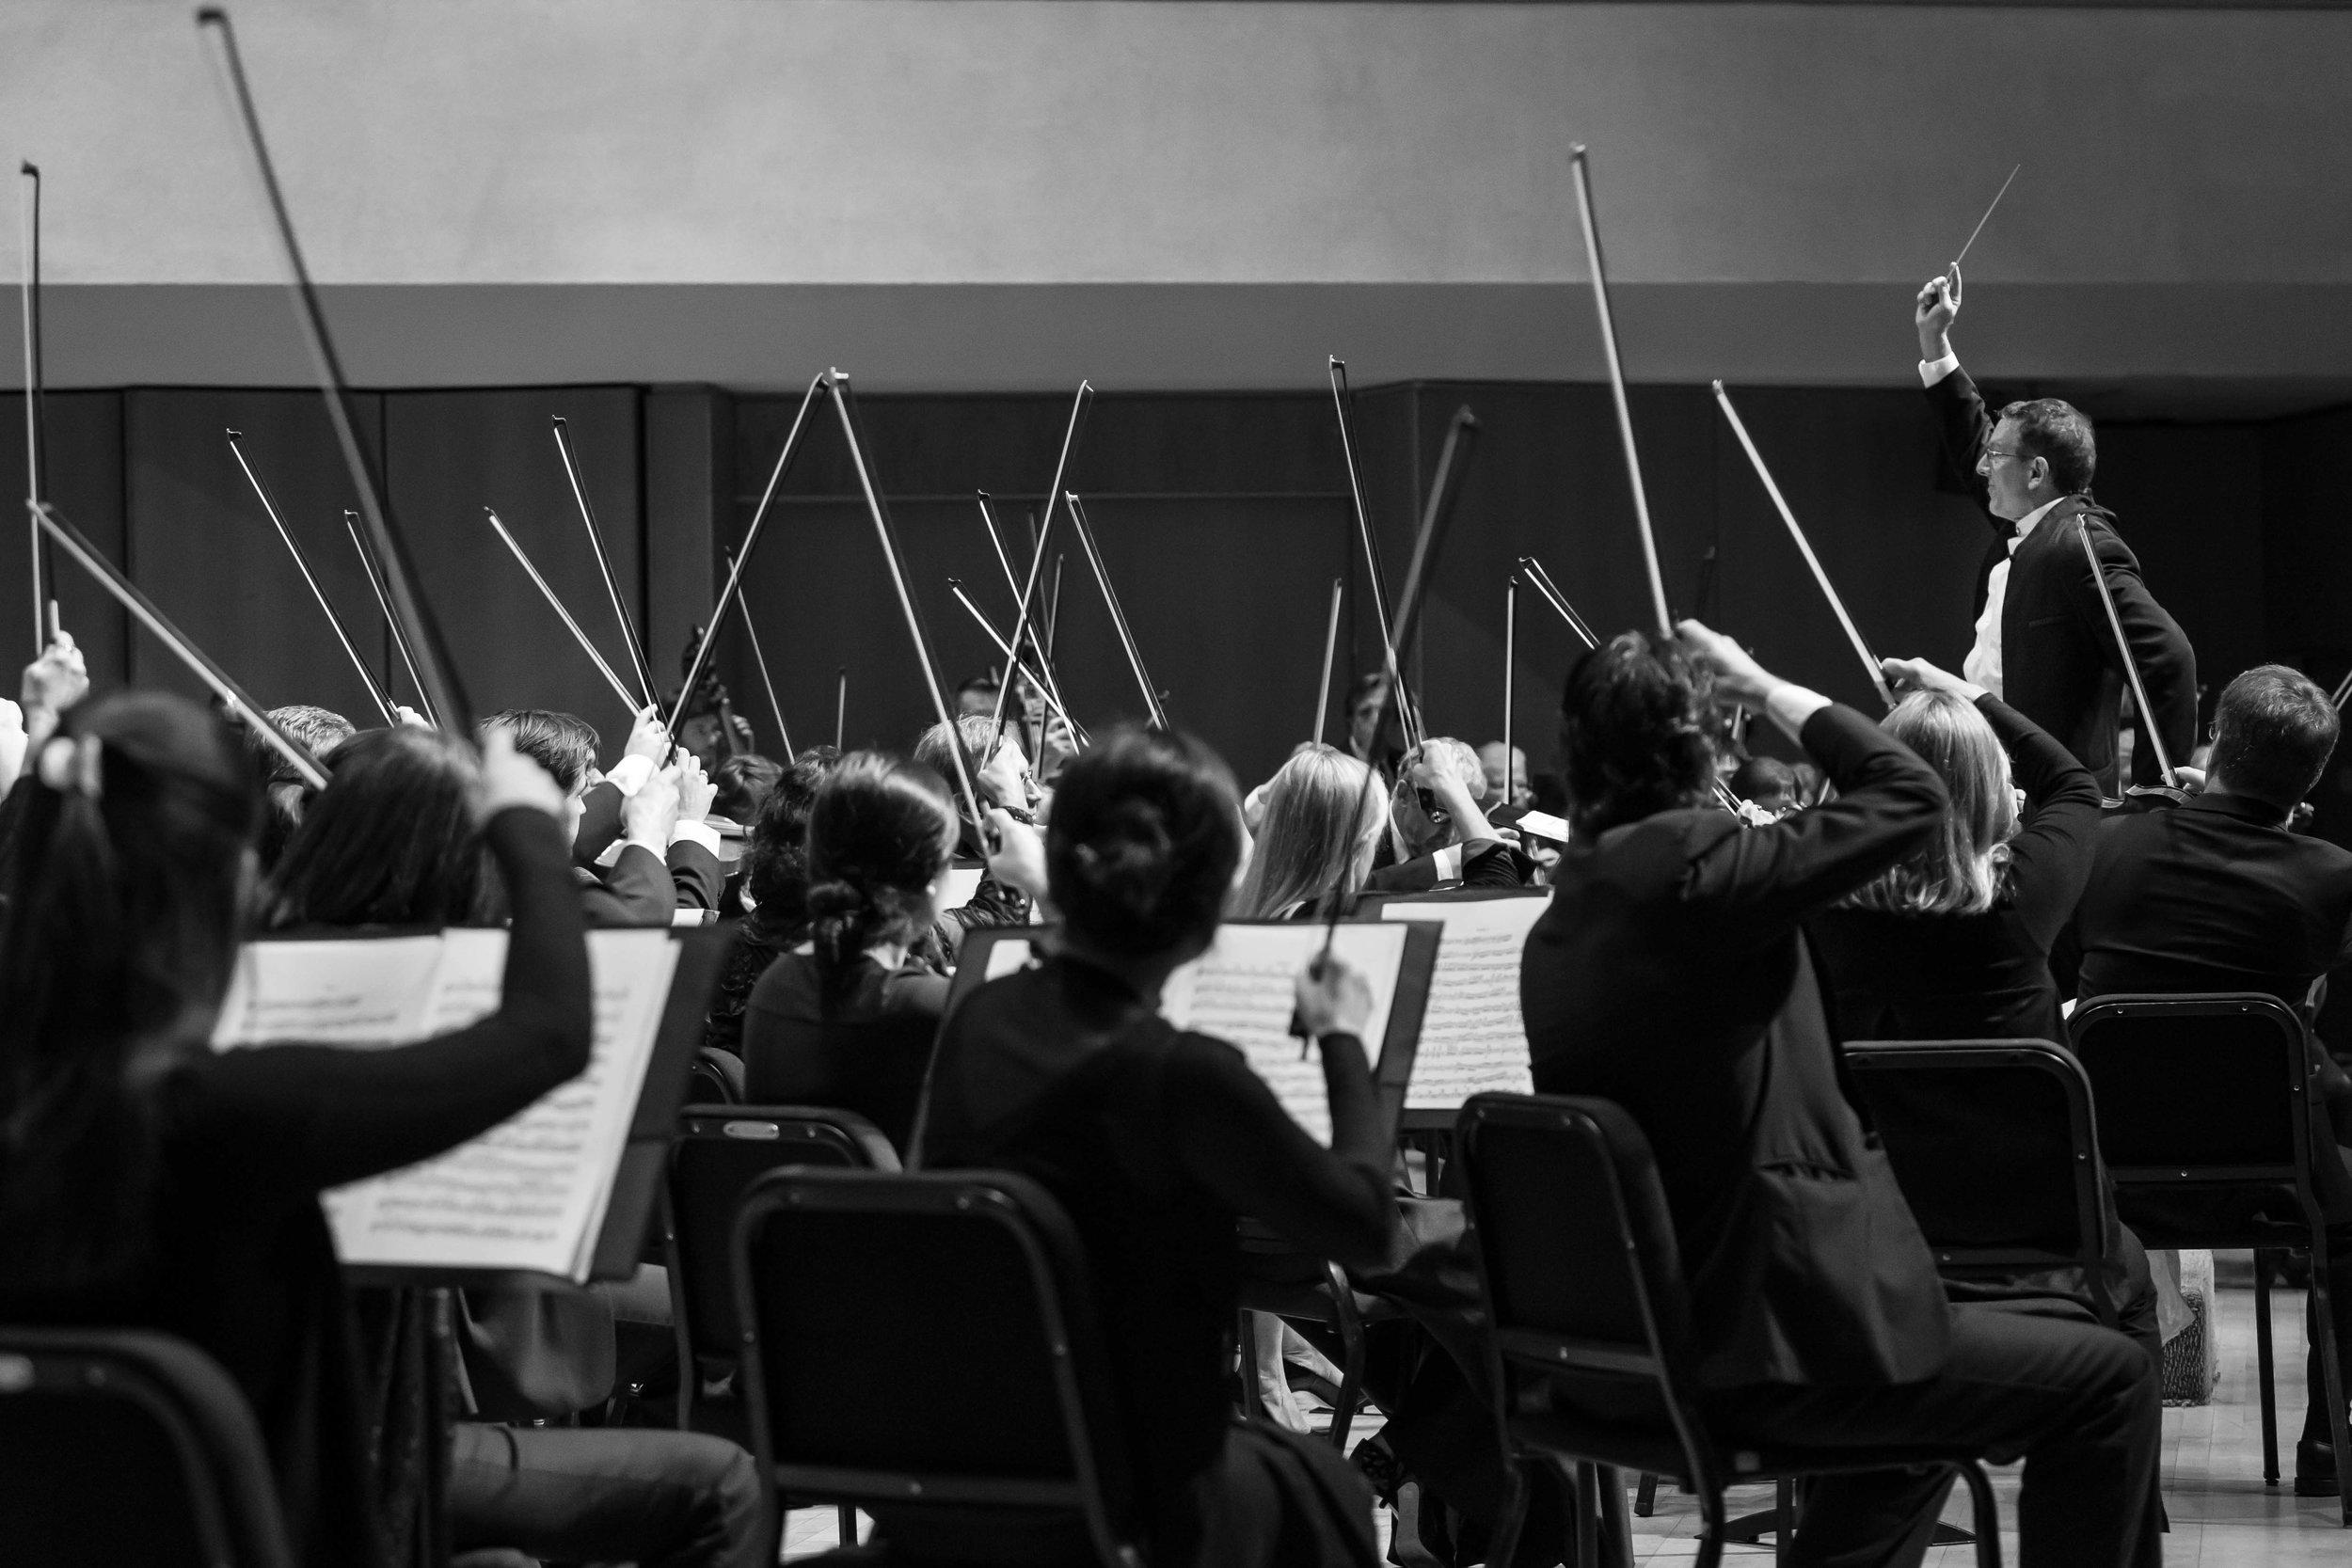 ChicagoPhilharmonic_9.18.16_by_ElliotMandel-1.jpg